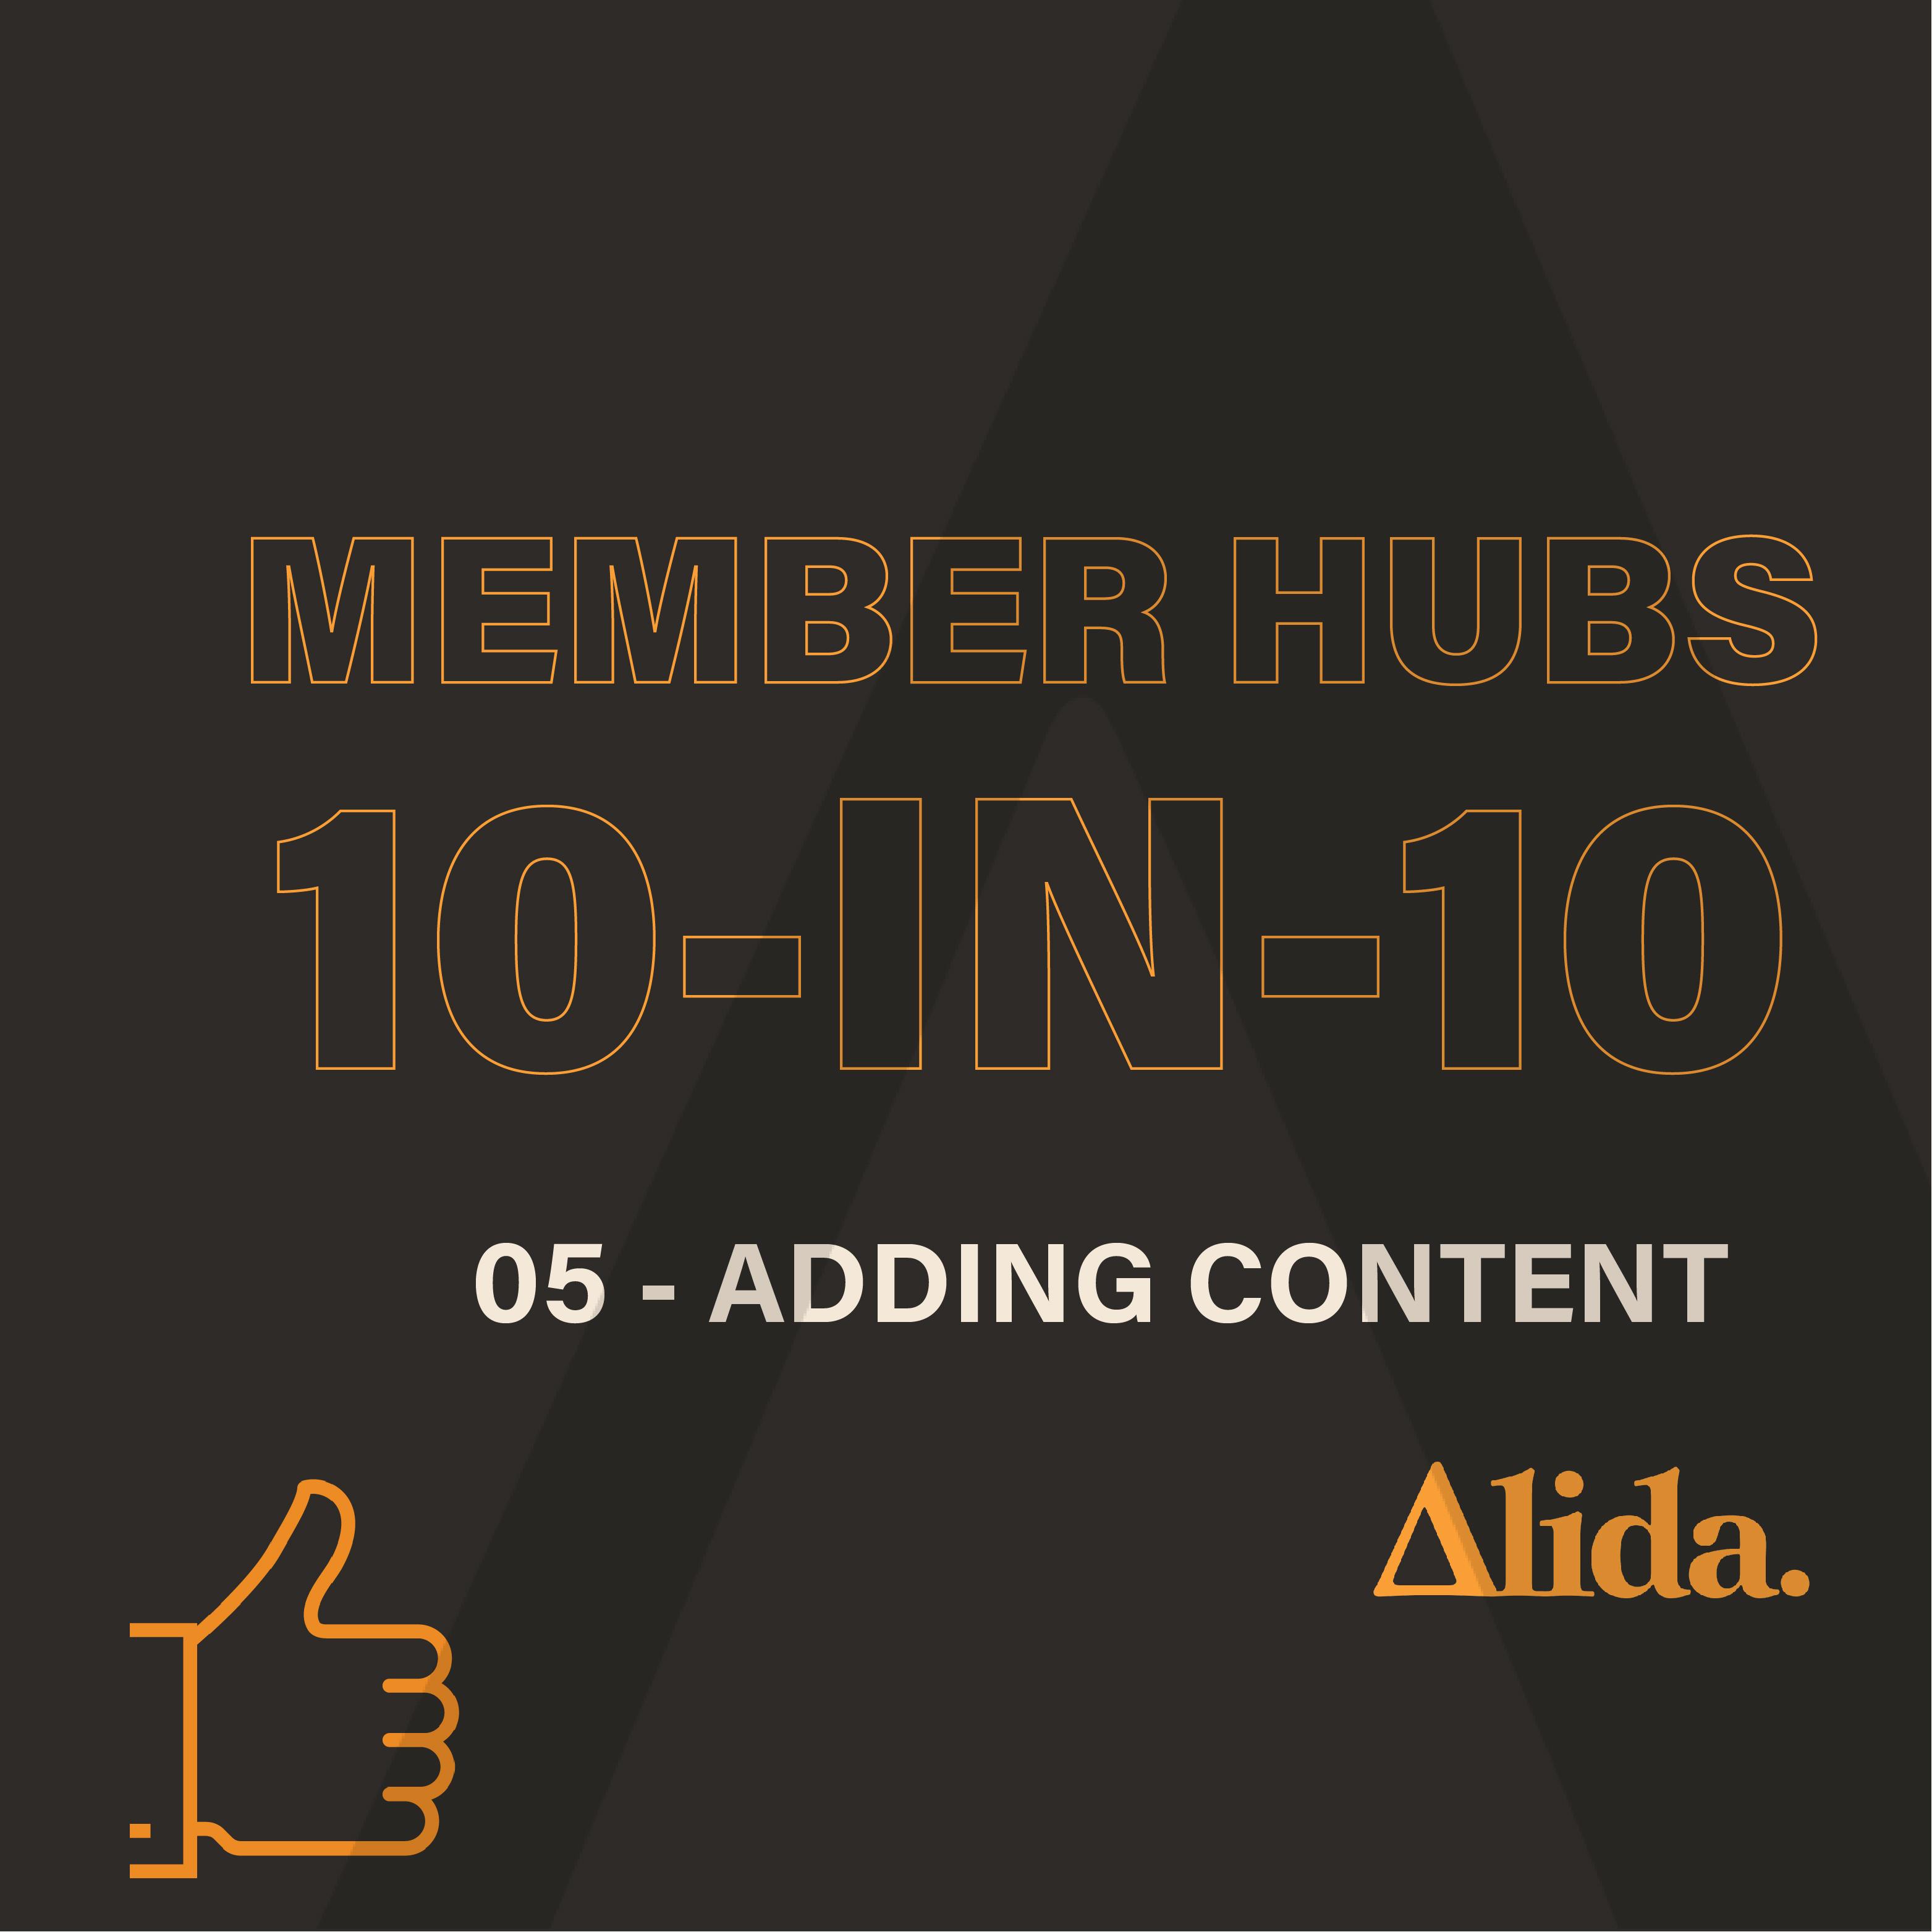 Member Hubs: Adding Content